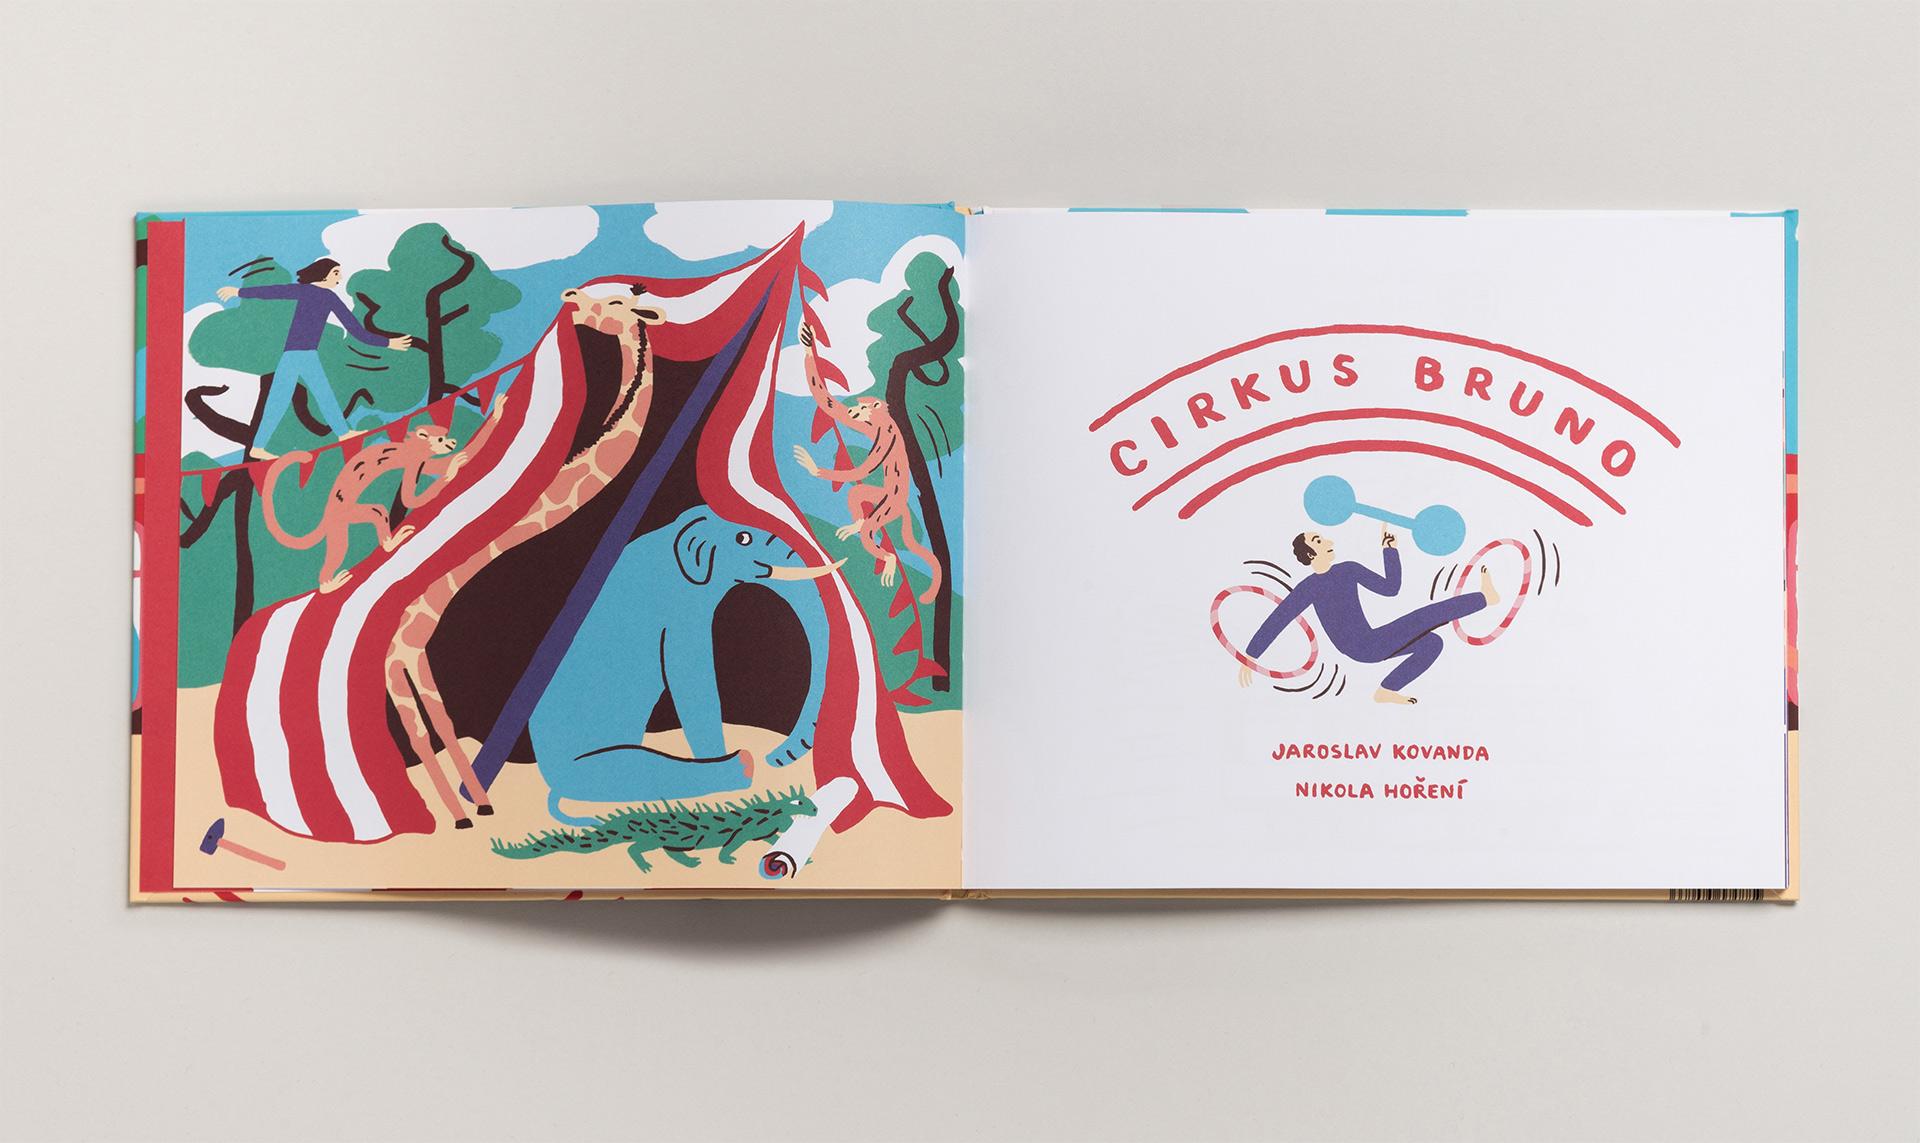 Cirkus-Bruno_03_titul